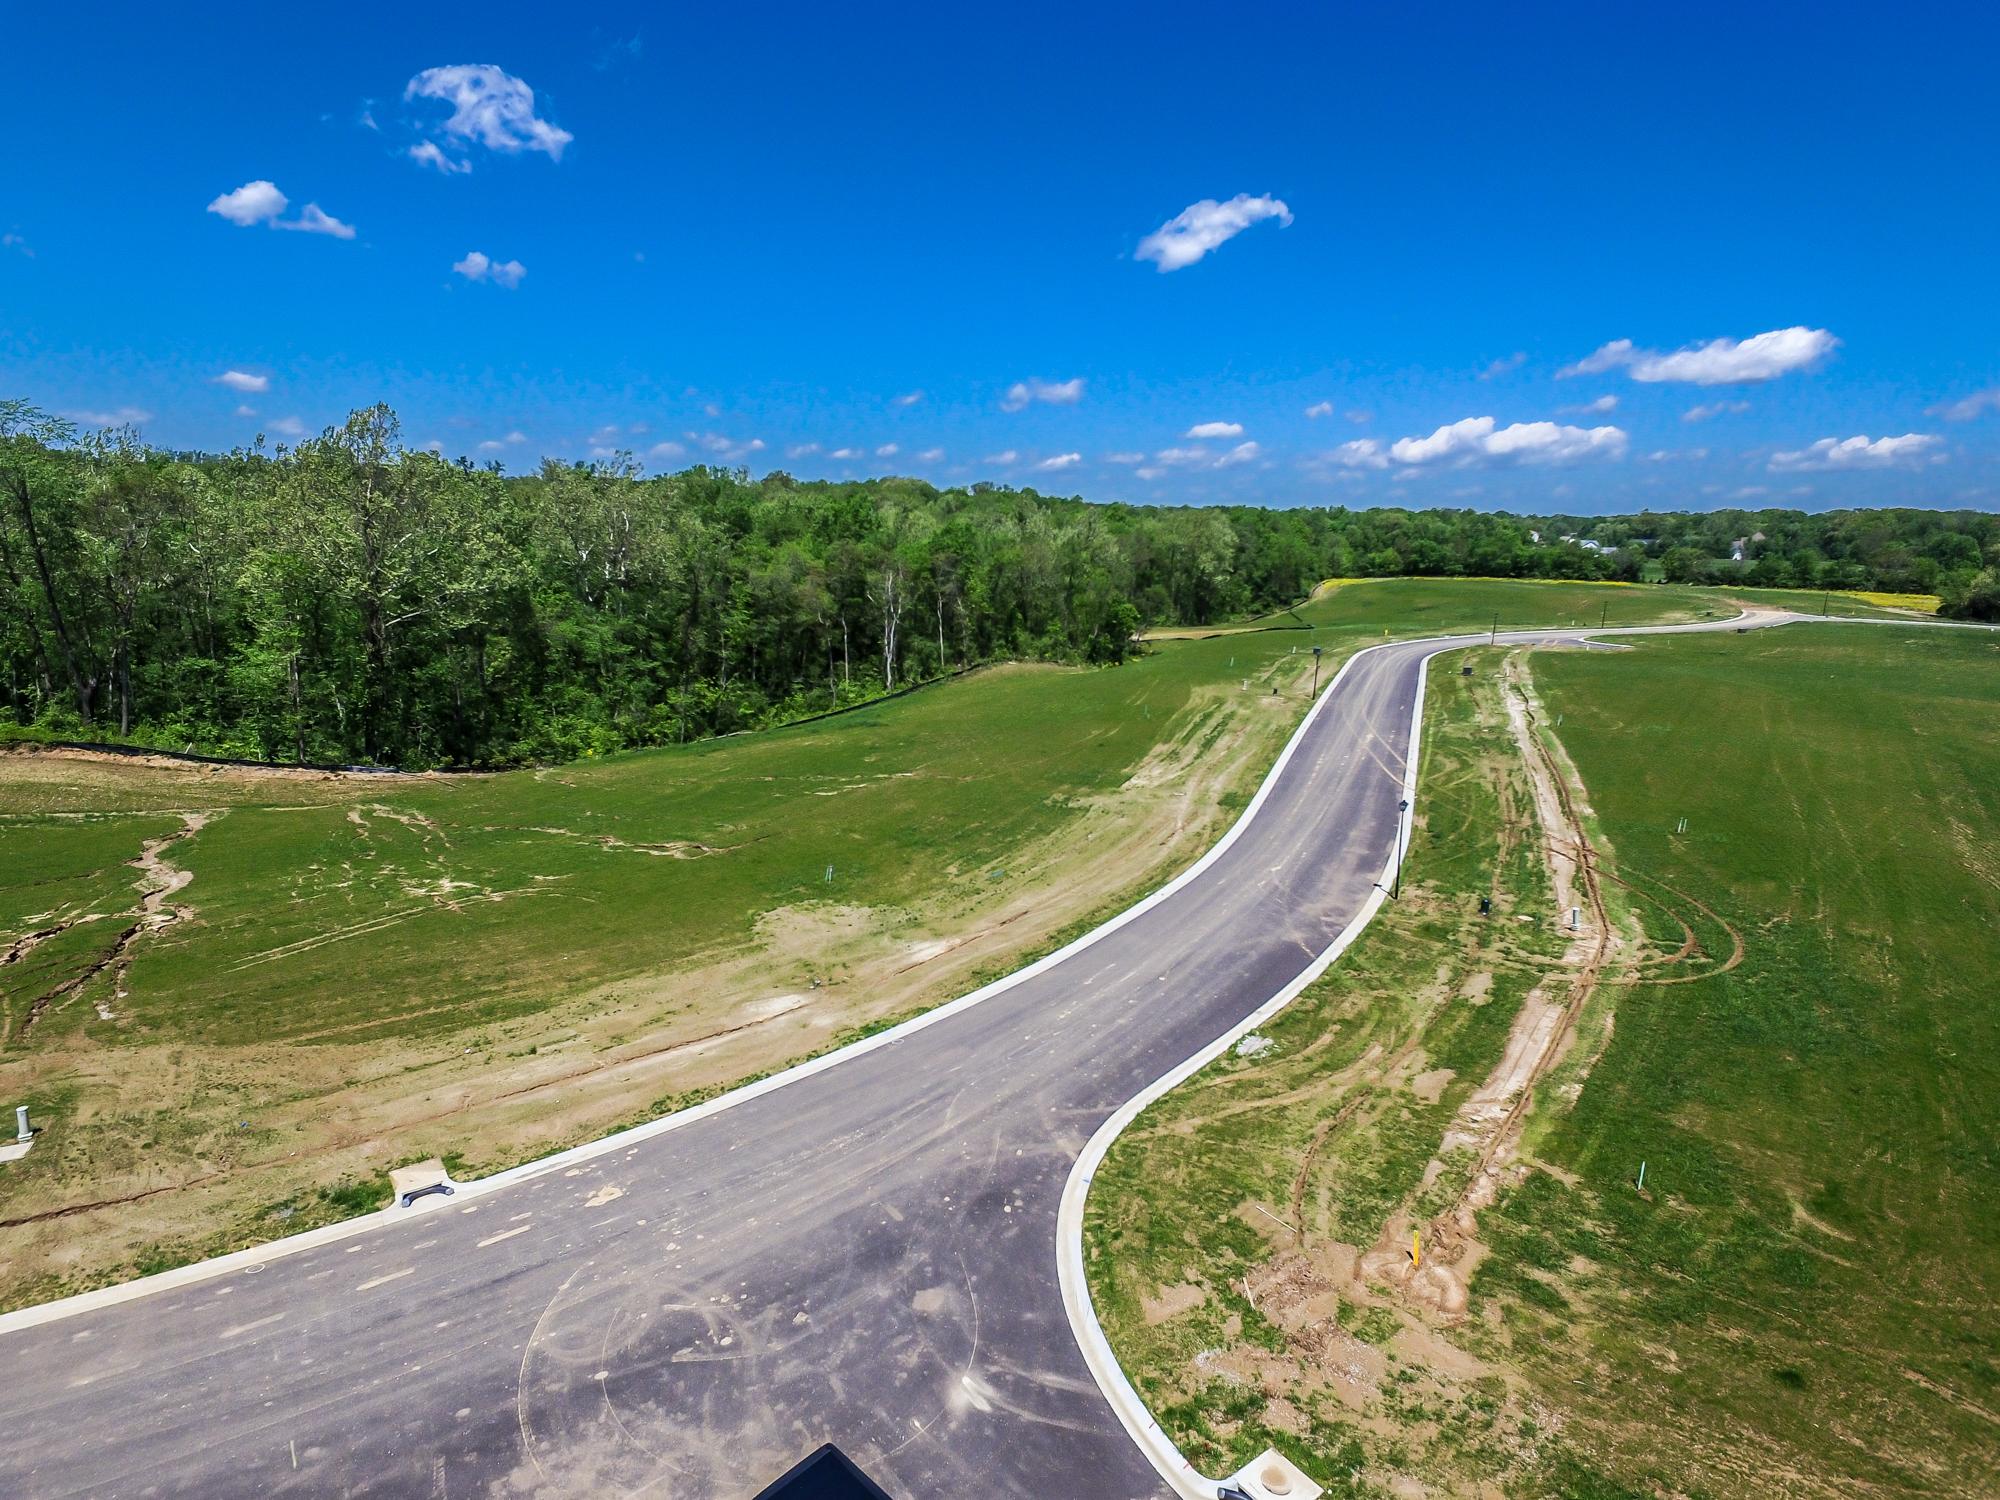 Bethel_Ridge_Farms_O'Fallon_Illinois_Aerials_Progress_5.3.17-15.jpg